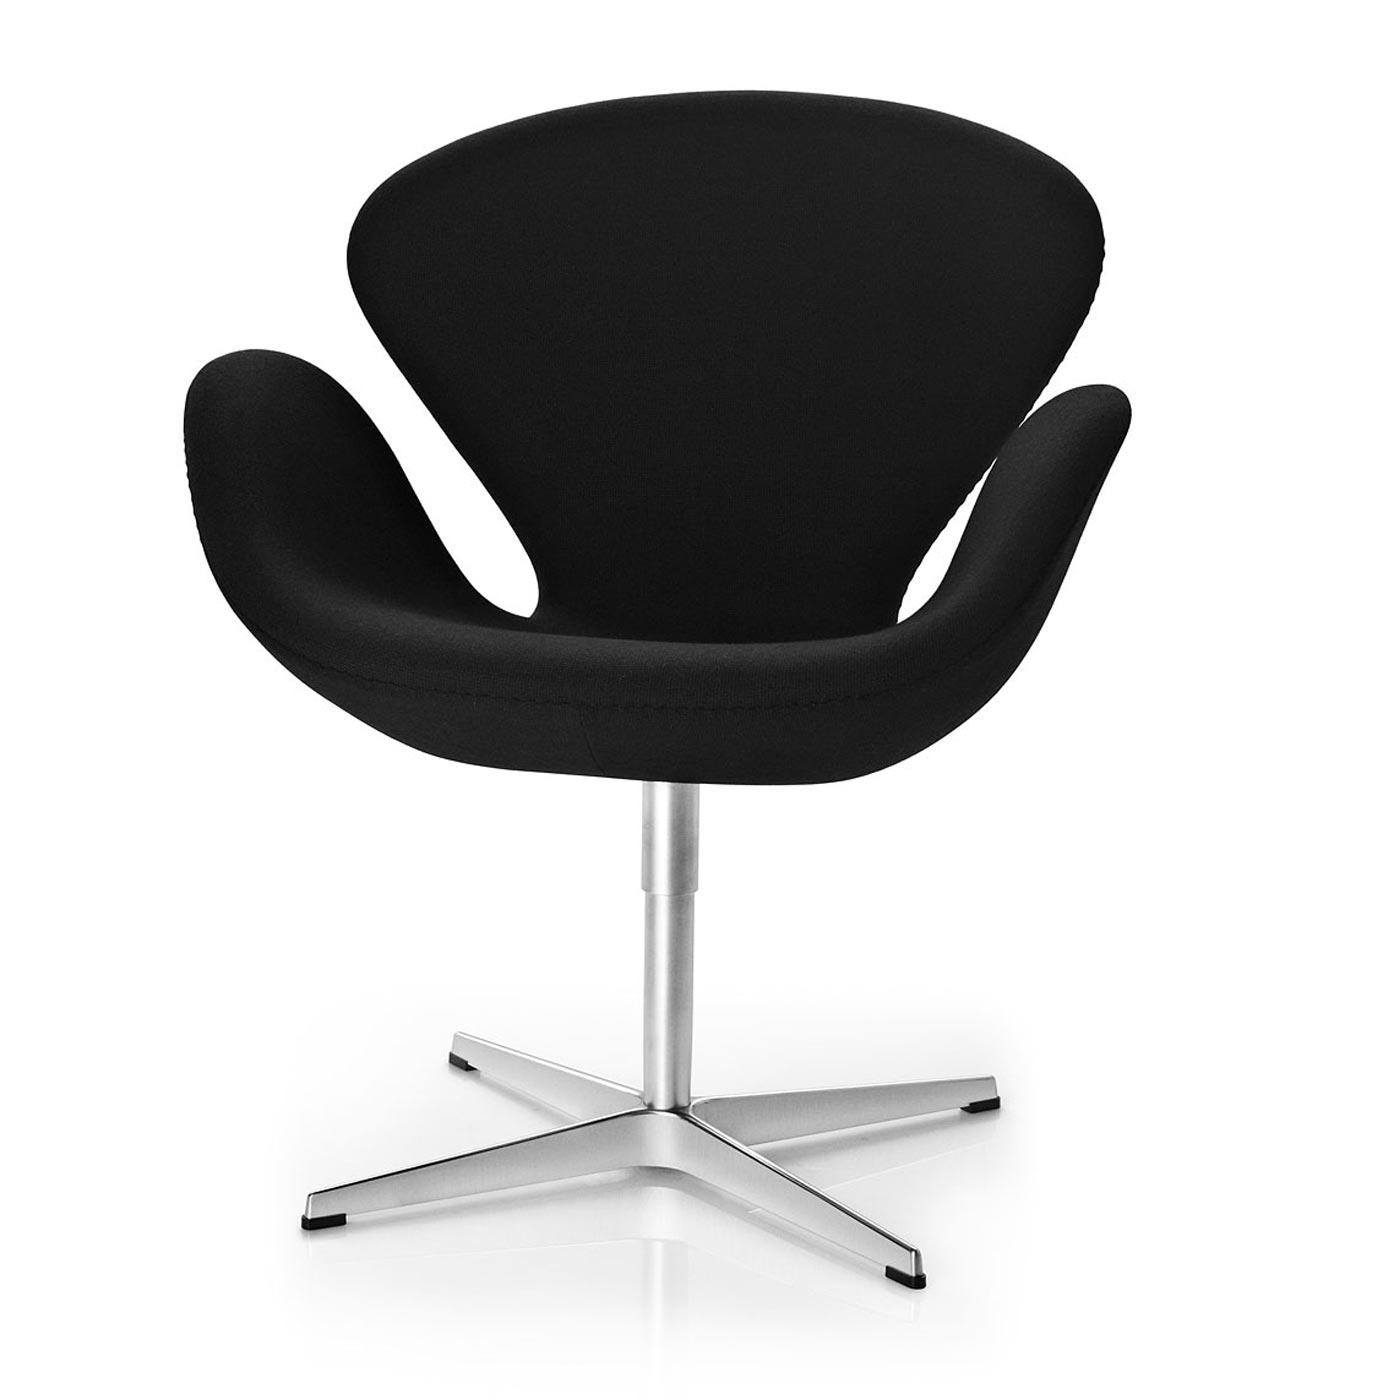 armchair swan by fritz hansen. Black Bedroom Furniture Sets. Home Design Ideas